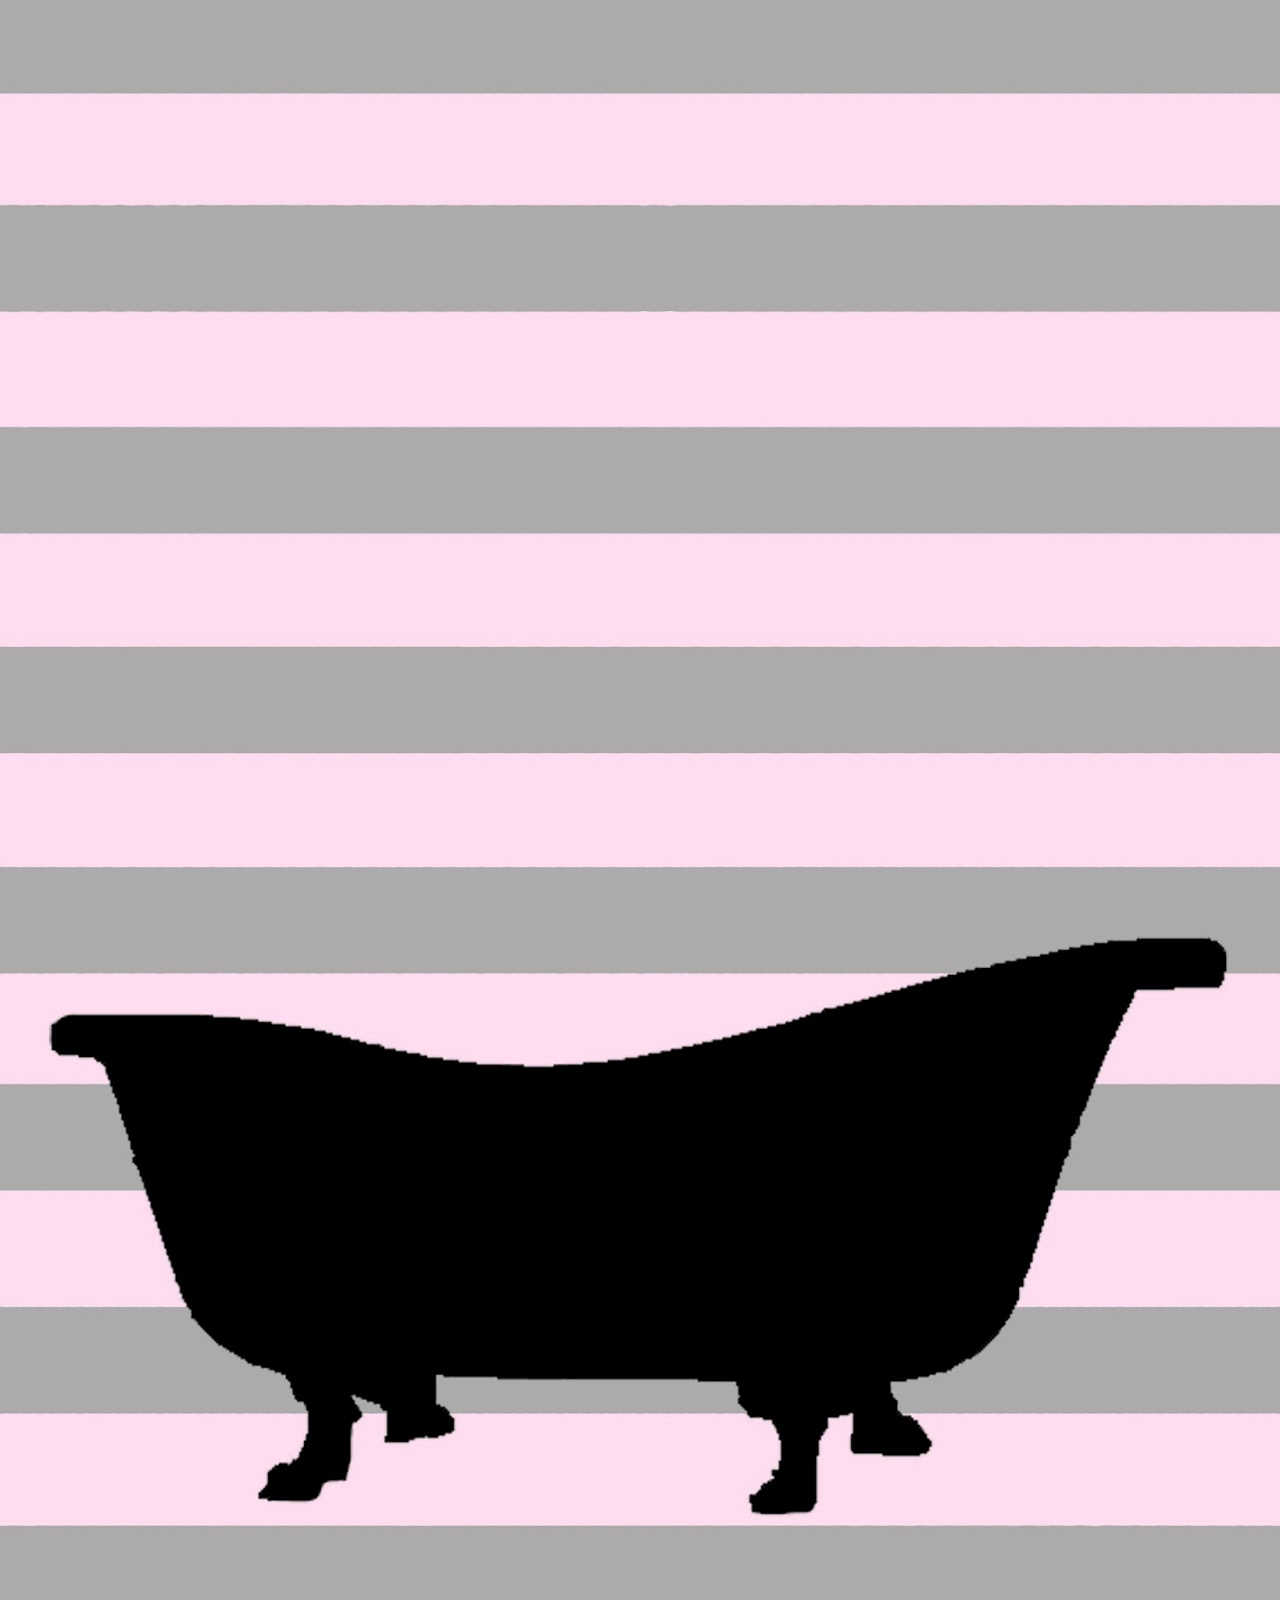 Free Cliparts Bathtub Silhouette, Download Free Clip Art.